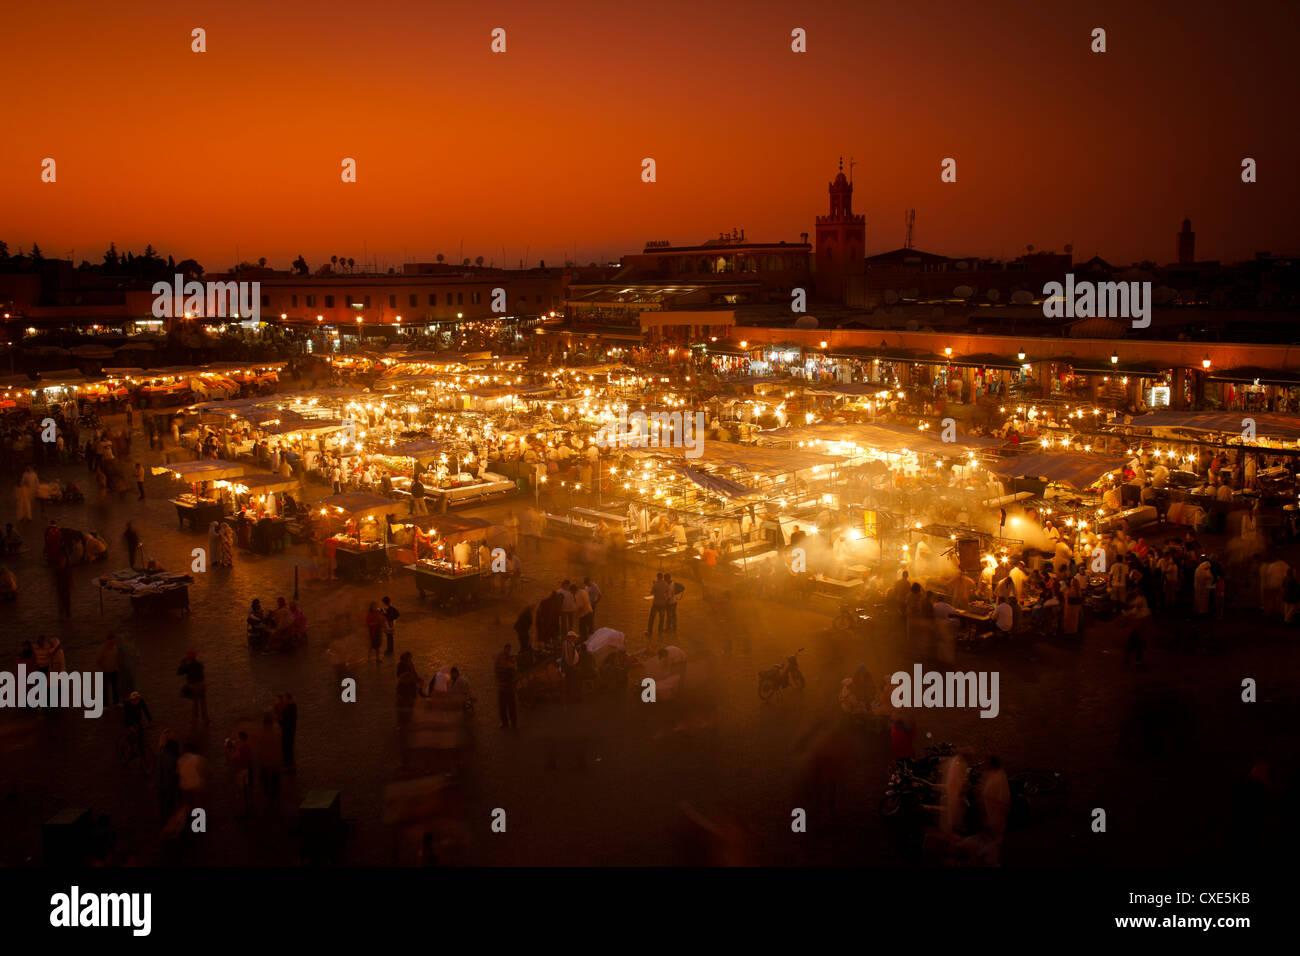 Vista al tramonto su Djemaa El Fna a Marrakech, Marocco, Africa Settentrionale, Africa Immagini Stock